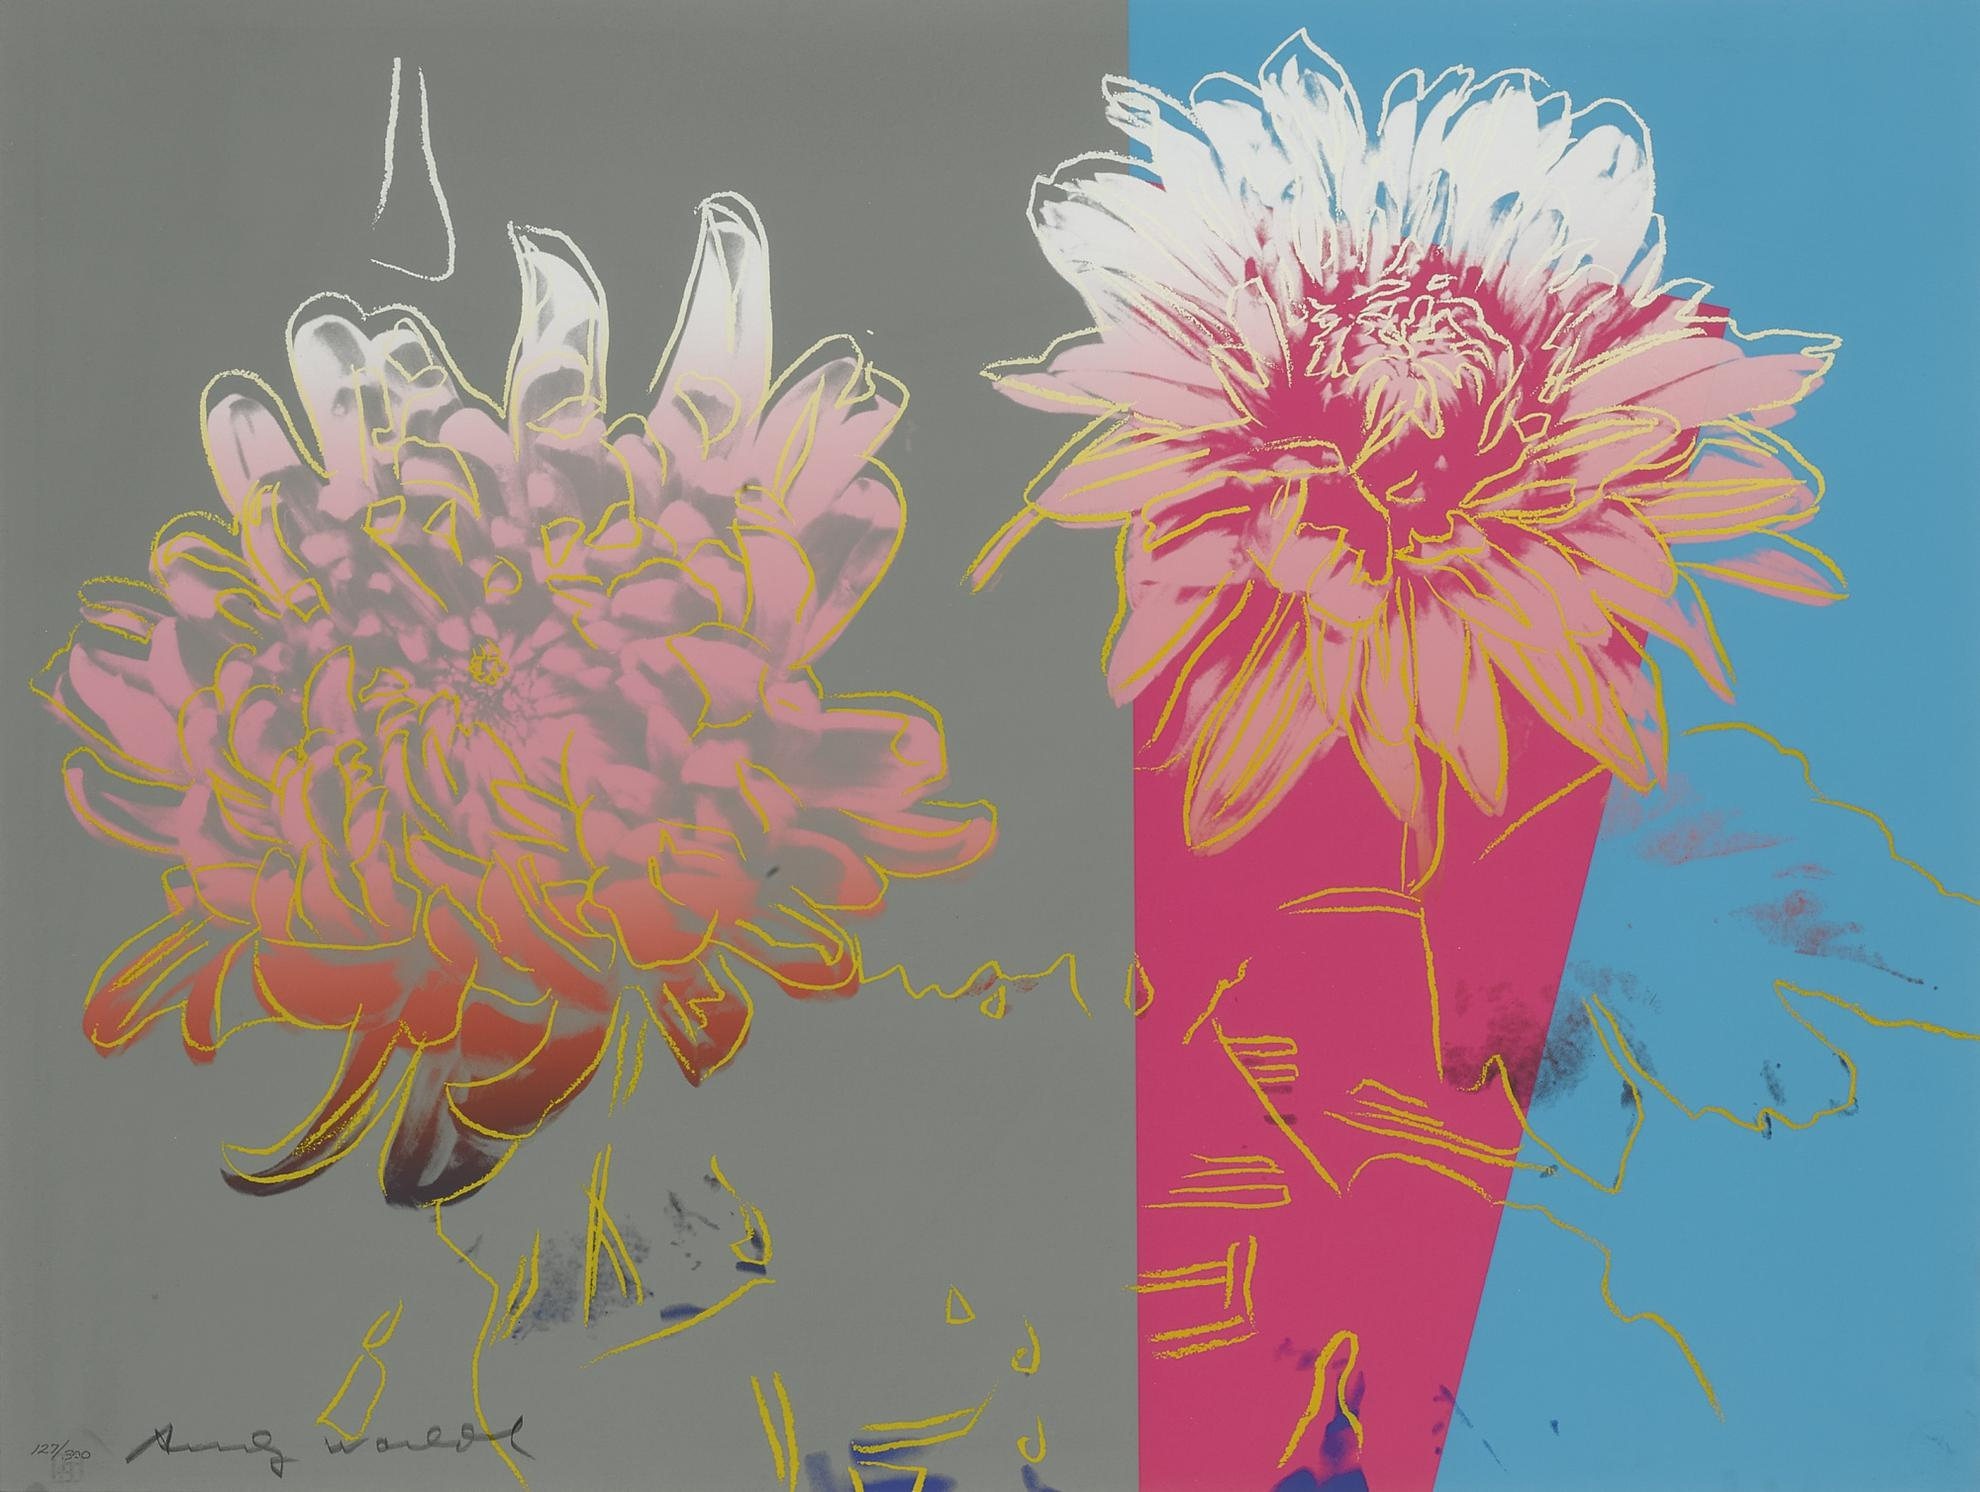 Andy Warhol-Kiku (F. & S. II.307-9)-1983